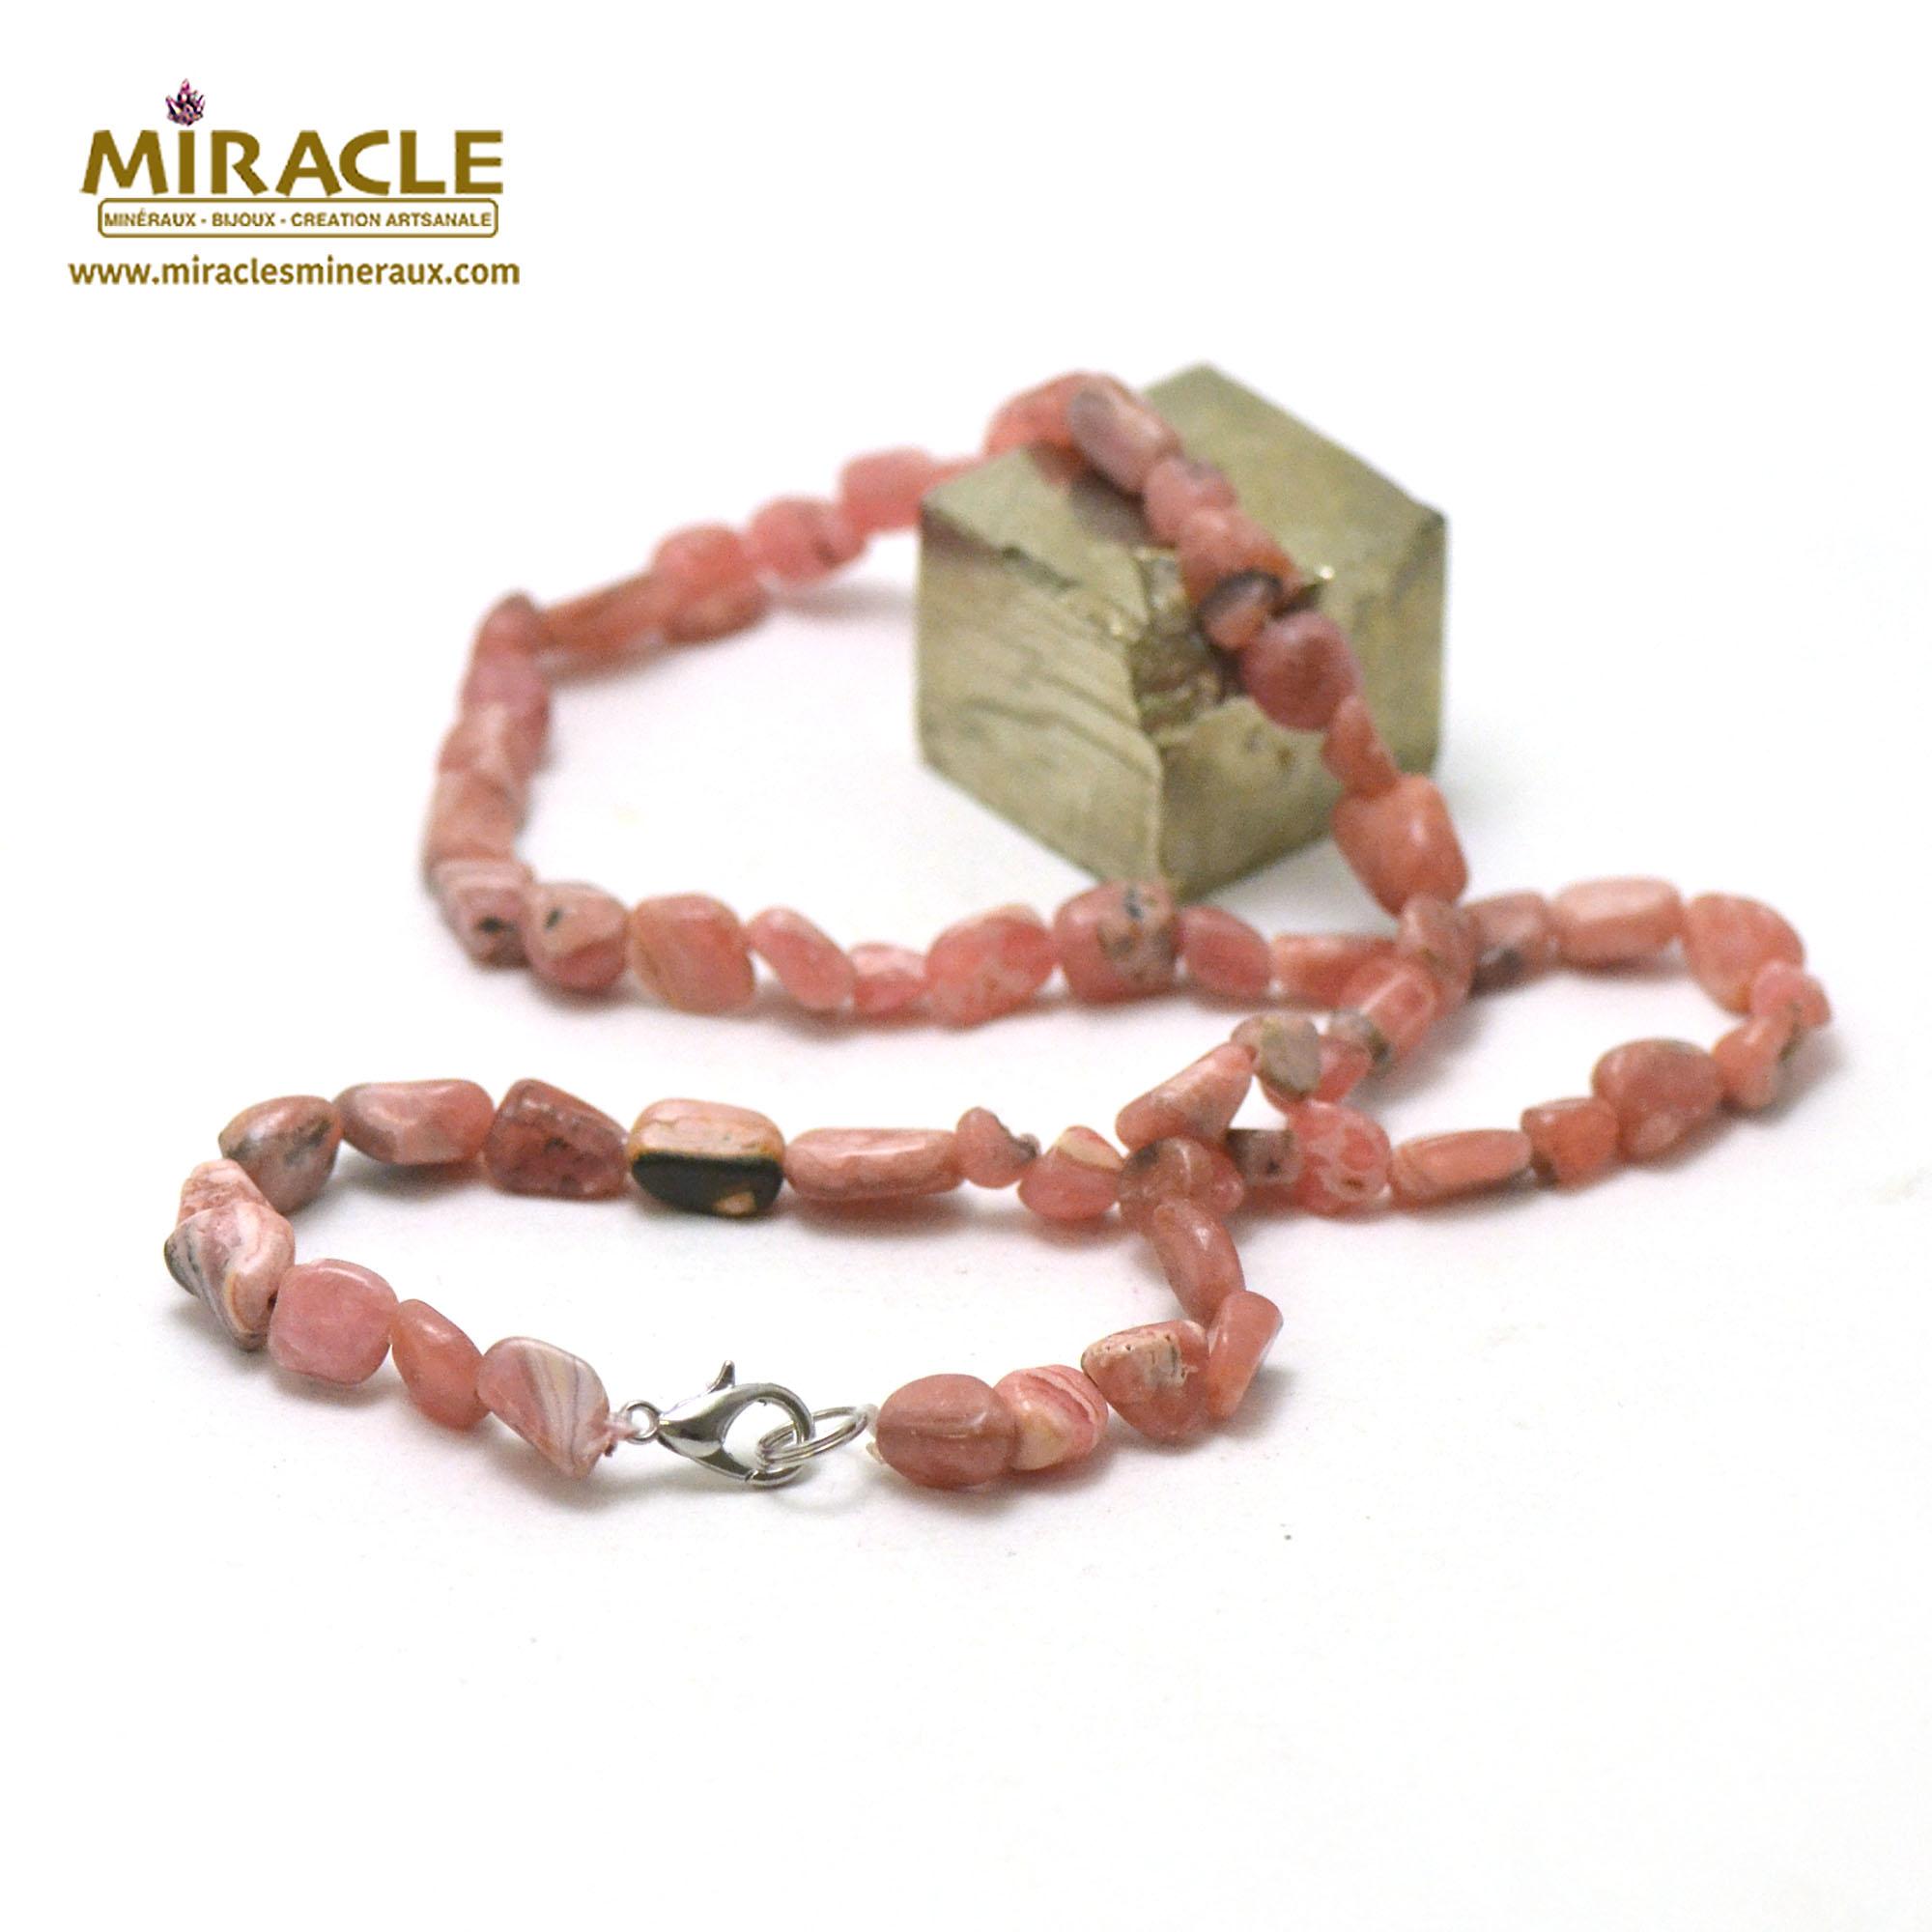 collier rhodochrosite, perle pierre roulée